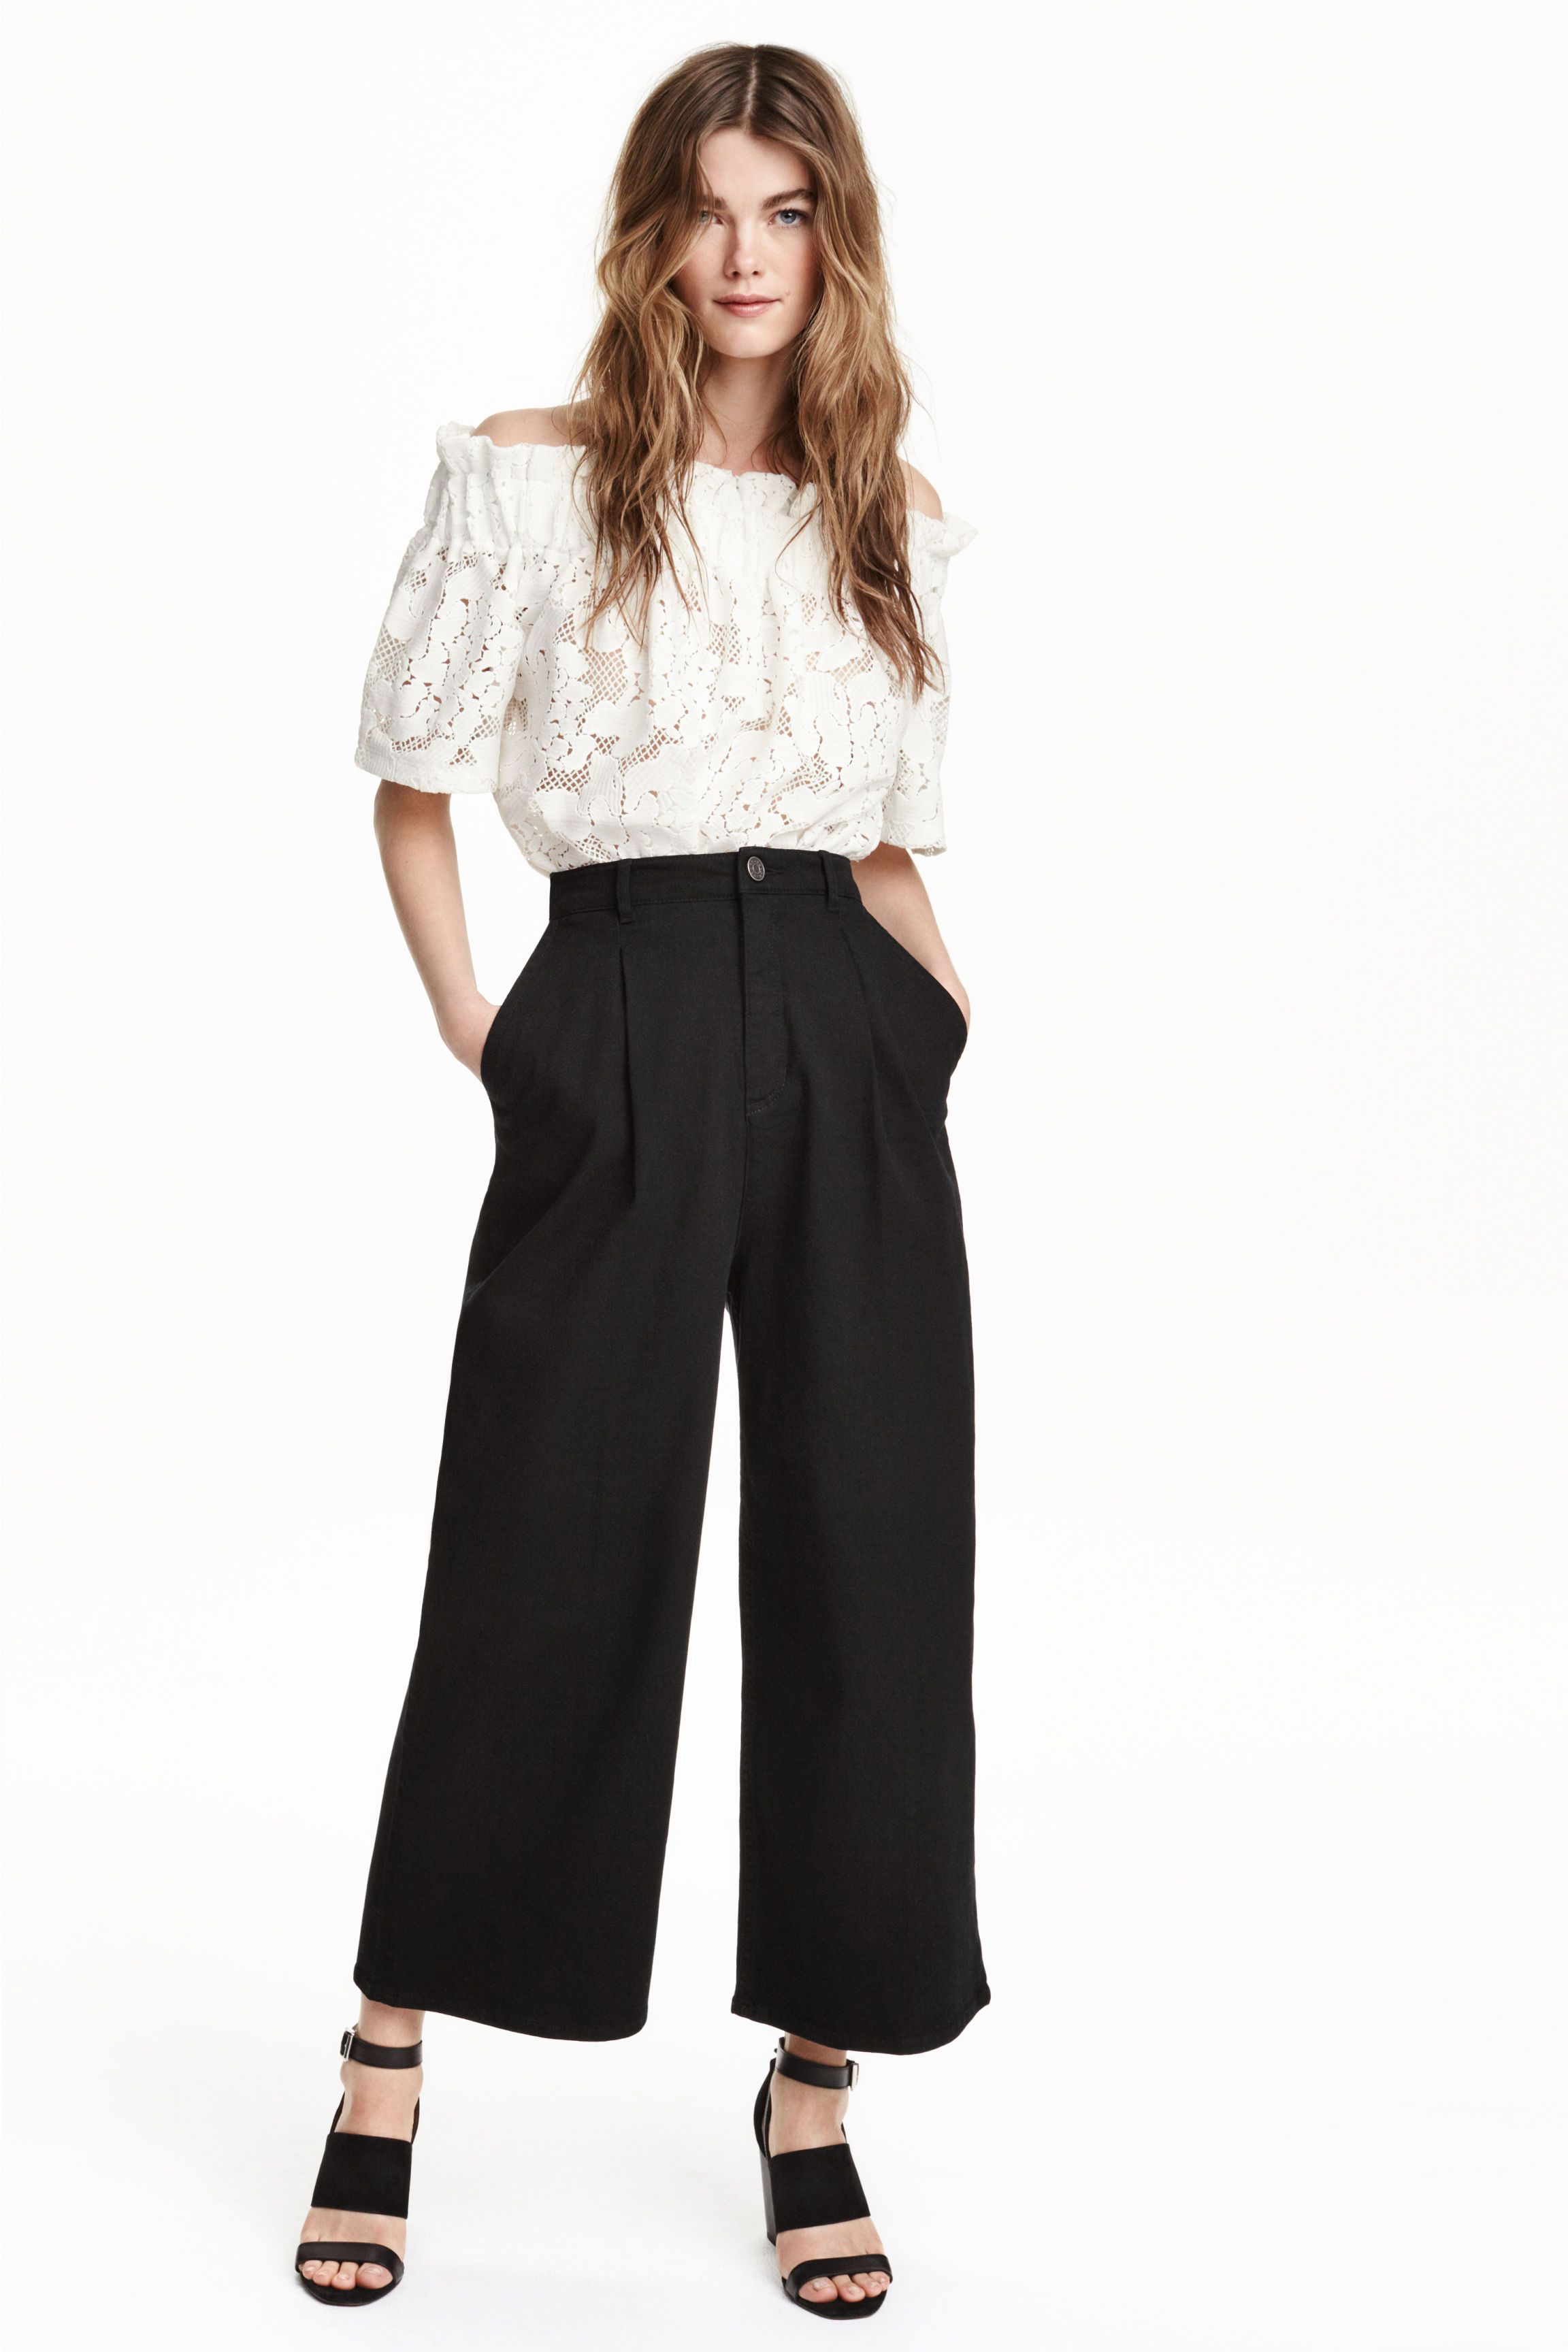 Pantalón ancho de sarga - Negro - MUJER | H&M ES